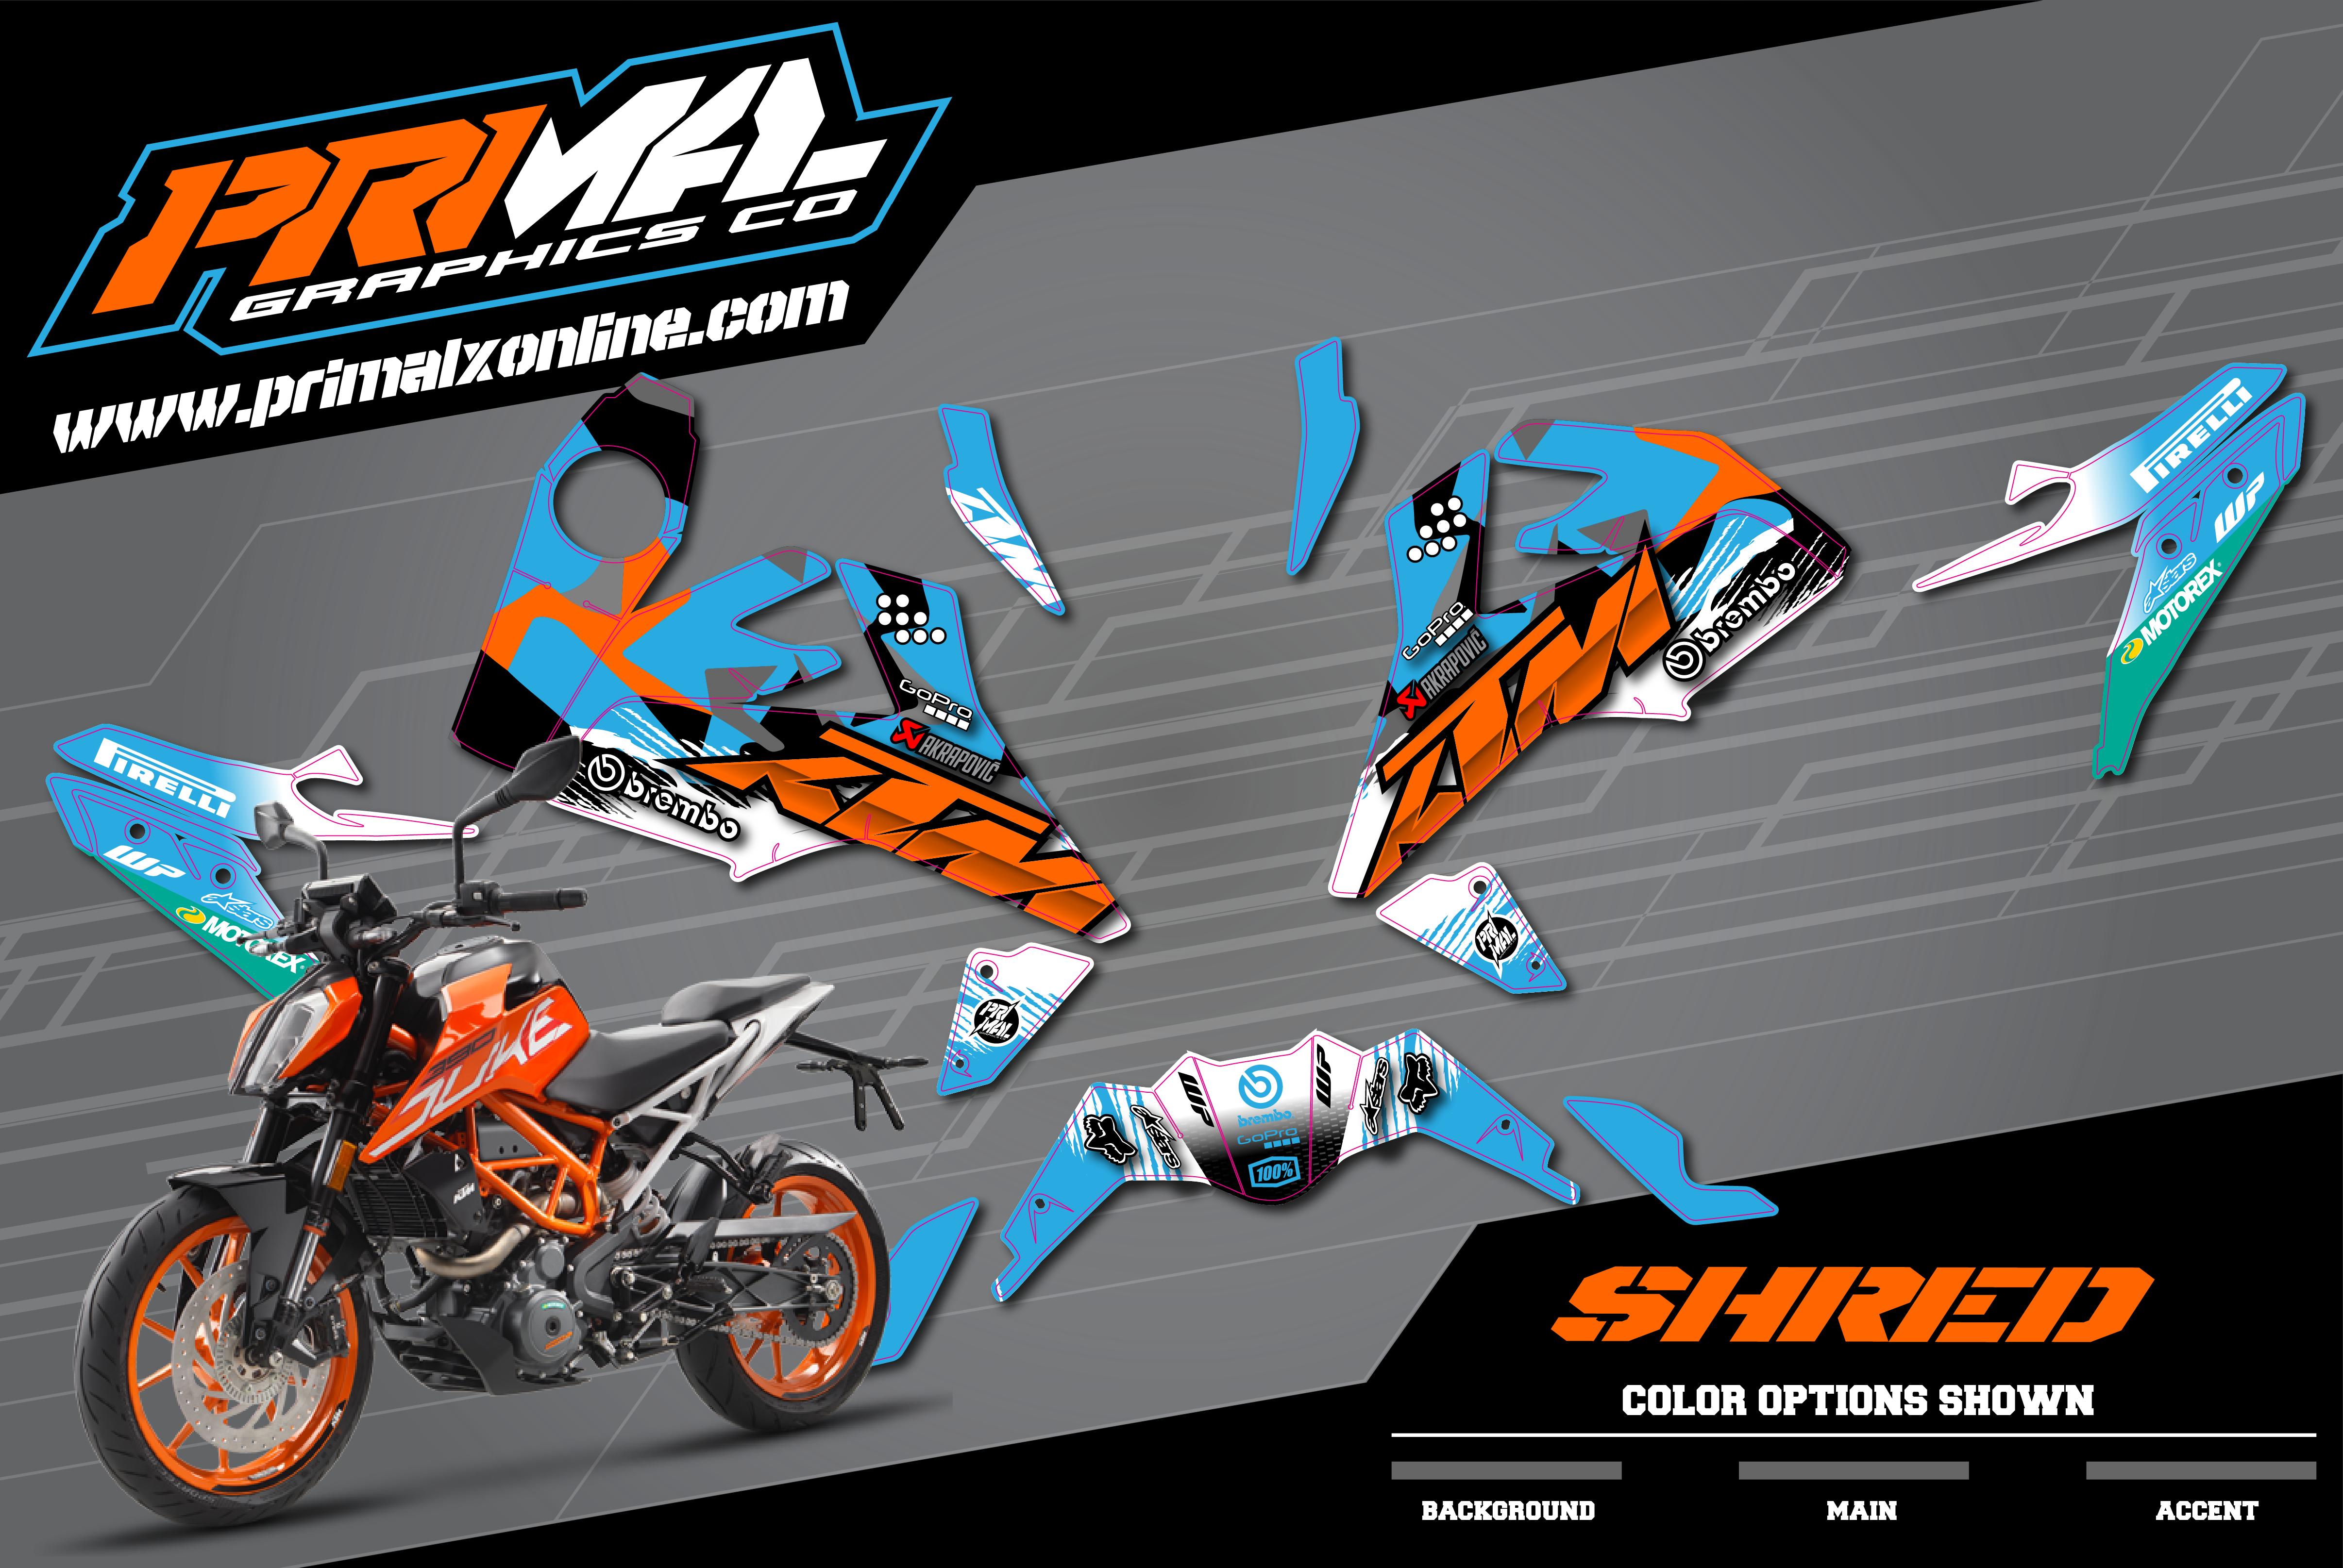 2_PRIMAL-X-MOTORSPORTS-PRIMAL-GRAPHICS-CO-KTM-DUKE-390-BIKELIFE-CHARMCITY-KINGS-MX-GRAPHICS-MX-DECALS-01